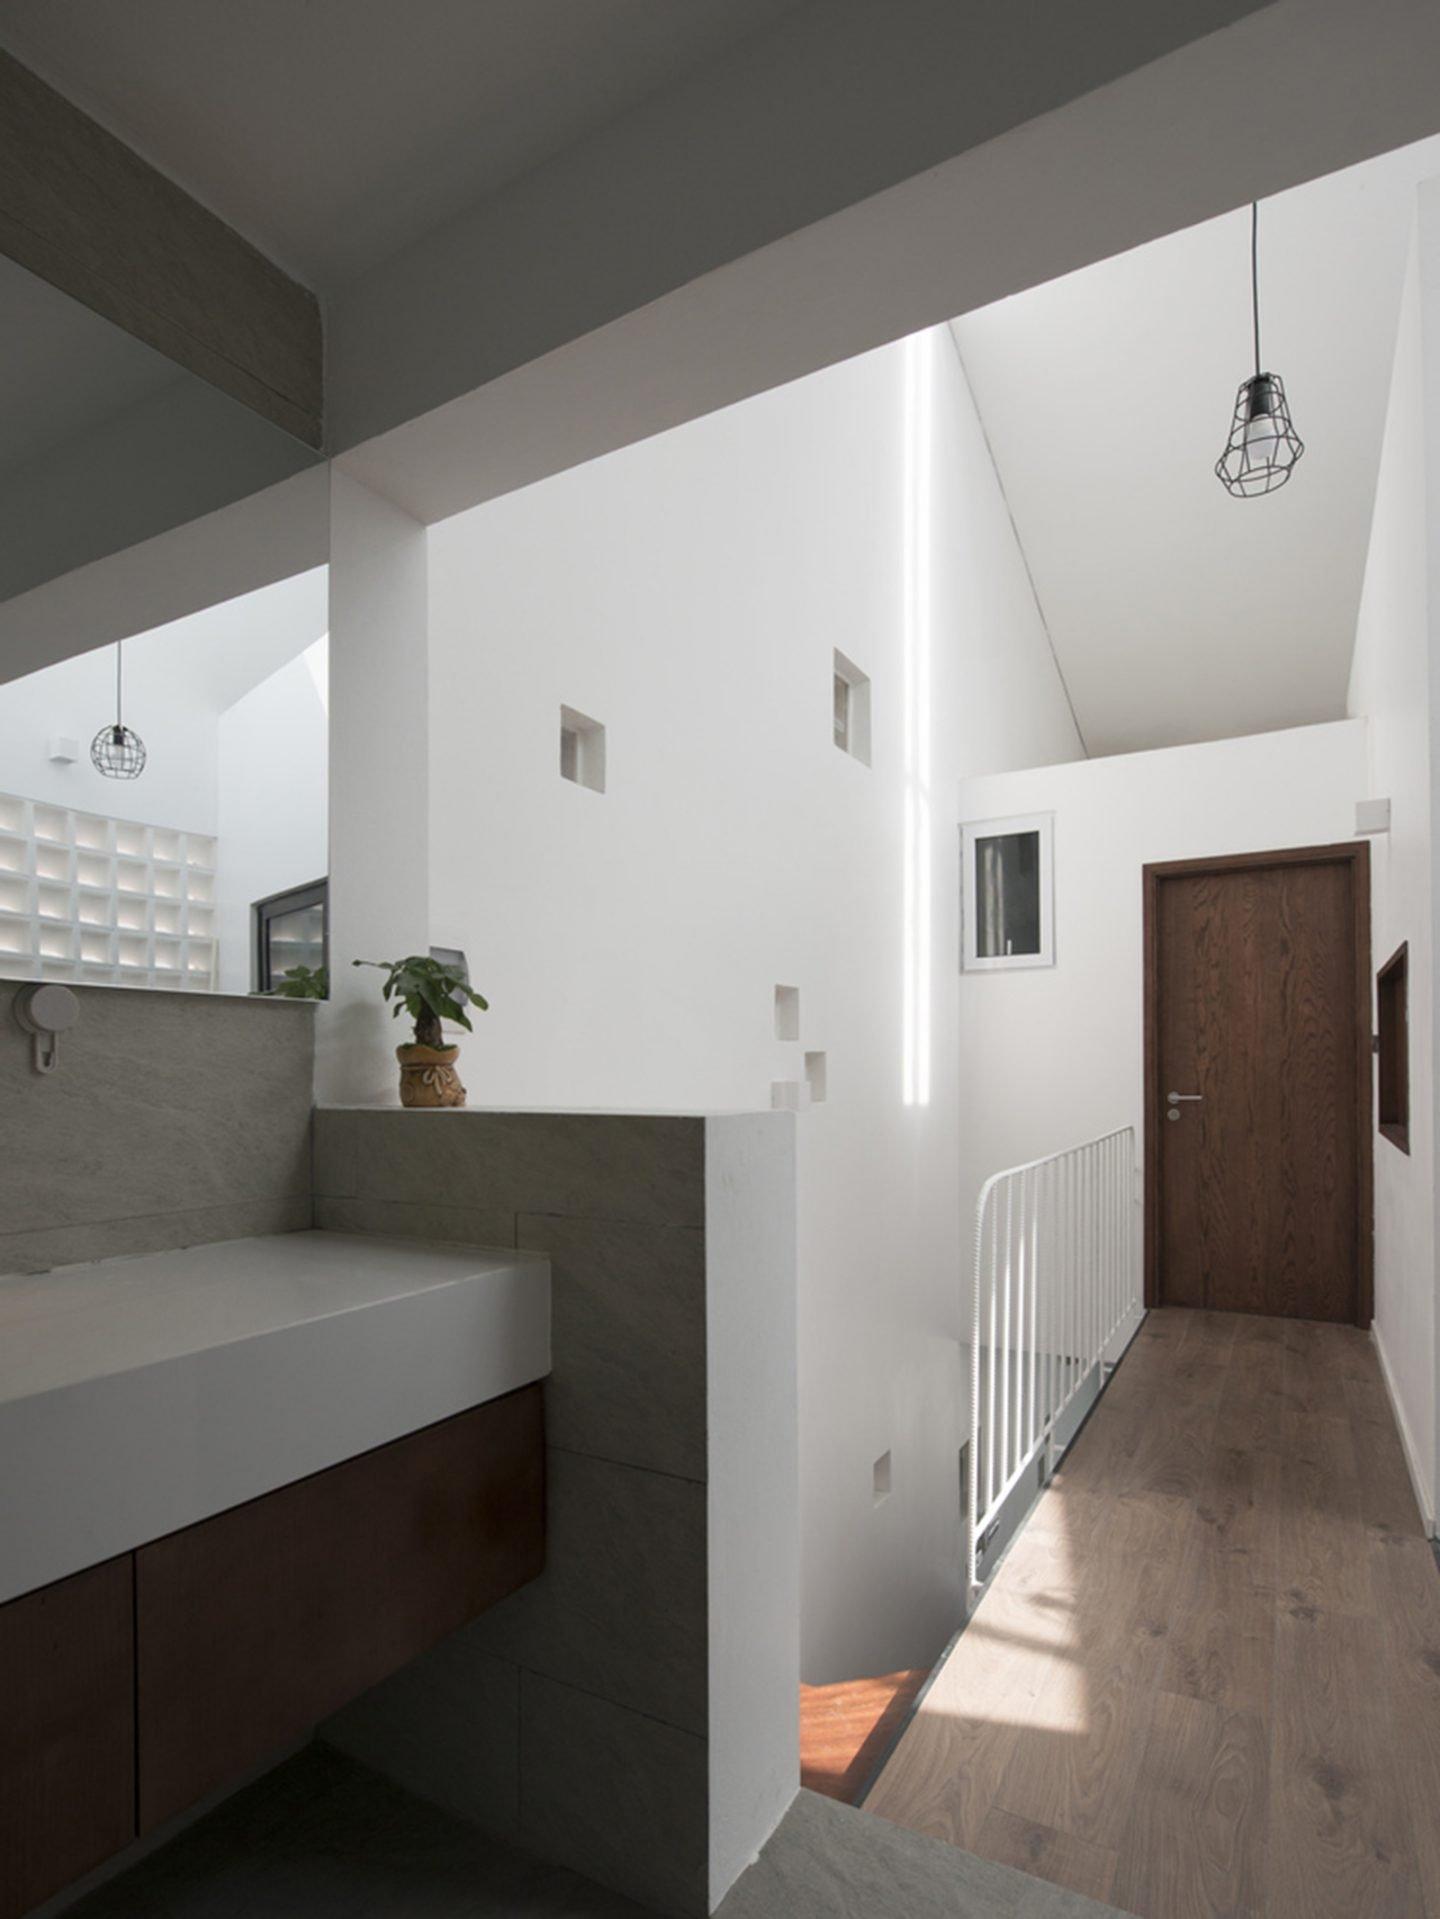 iGNANT-Architecture-Toob-Studios-5x12House-007